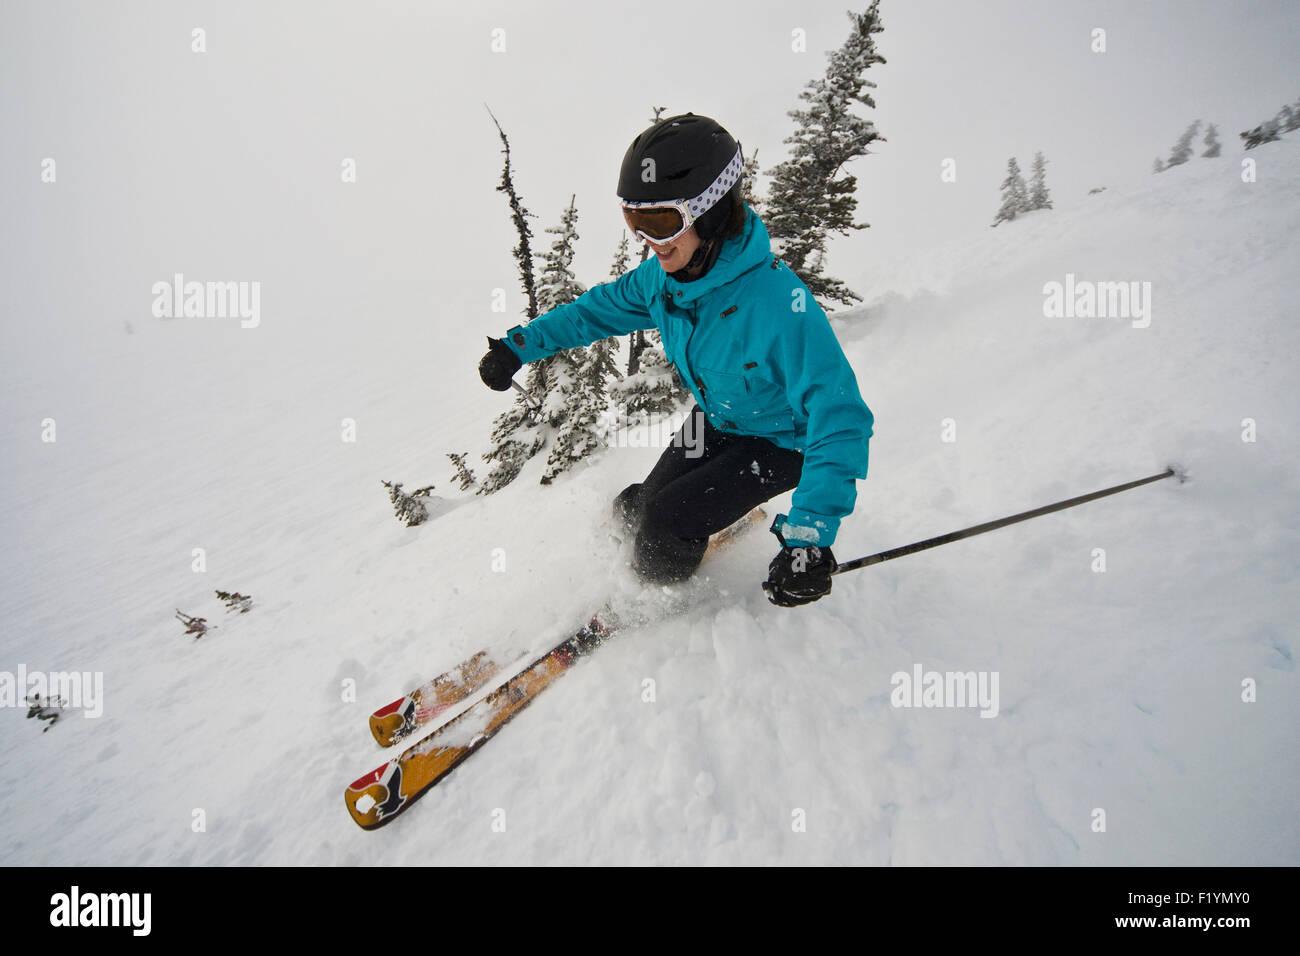 Canada,Skiing,Woman,Smiling,Whistler Mountain - Stock Image